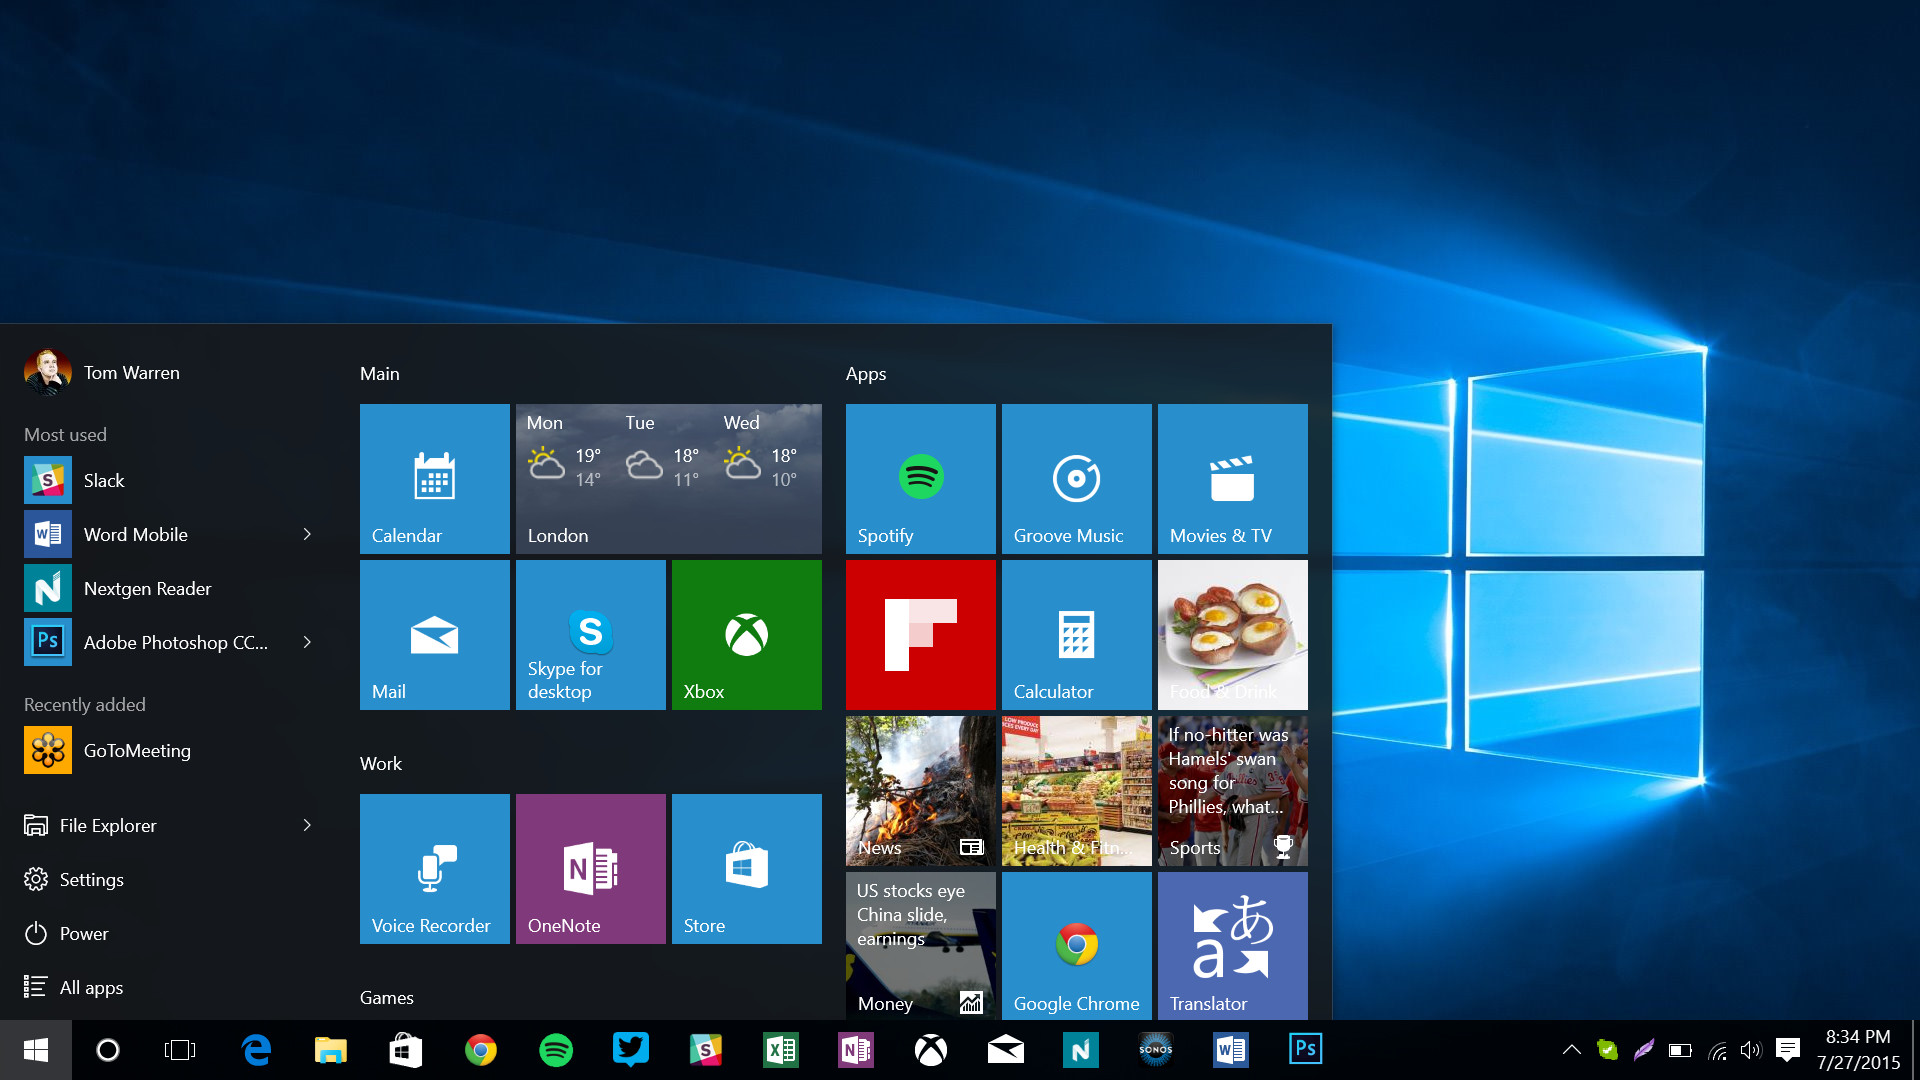 Custom Keyboard Calendar Custom Computer Keyboard Glassgiant Windows 10 Review The Verge